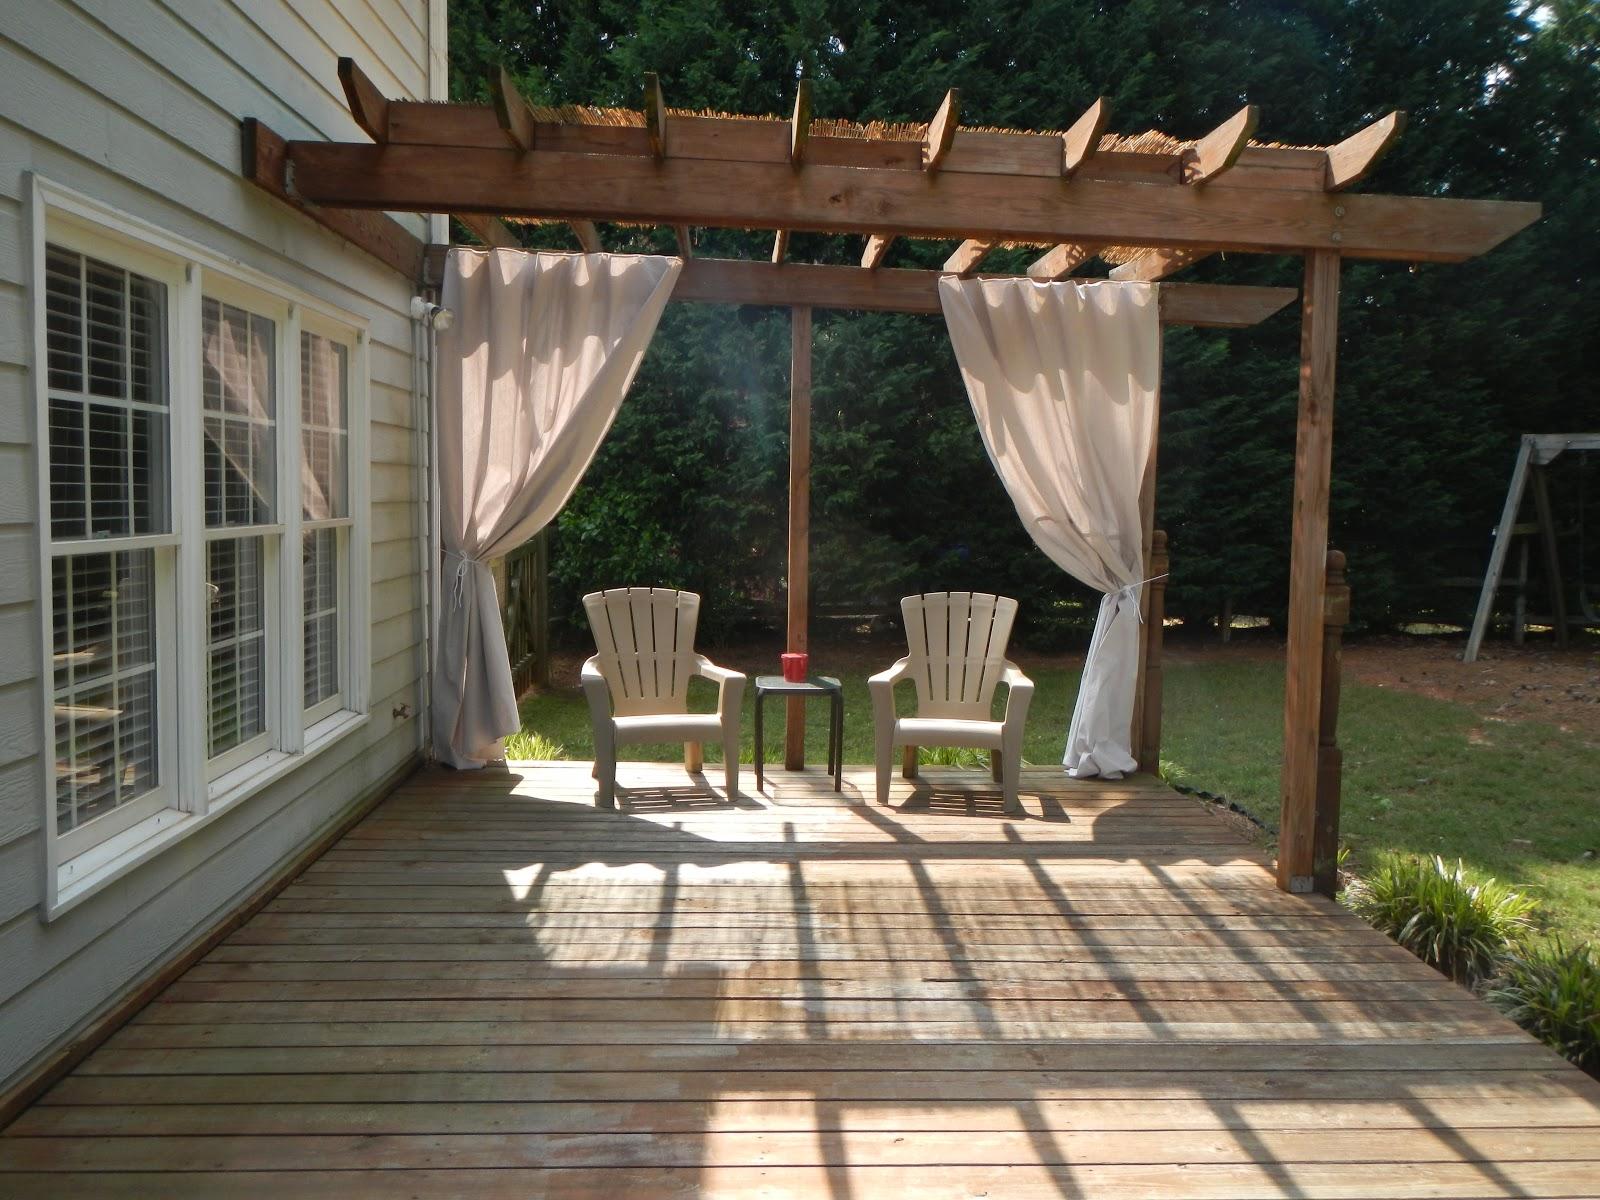 Roof Design Ideas: Cheriesparetime: Over Hauling Back Deck